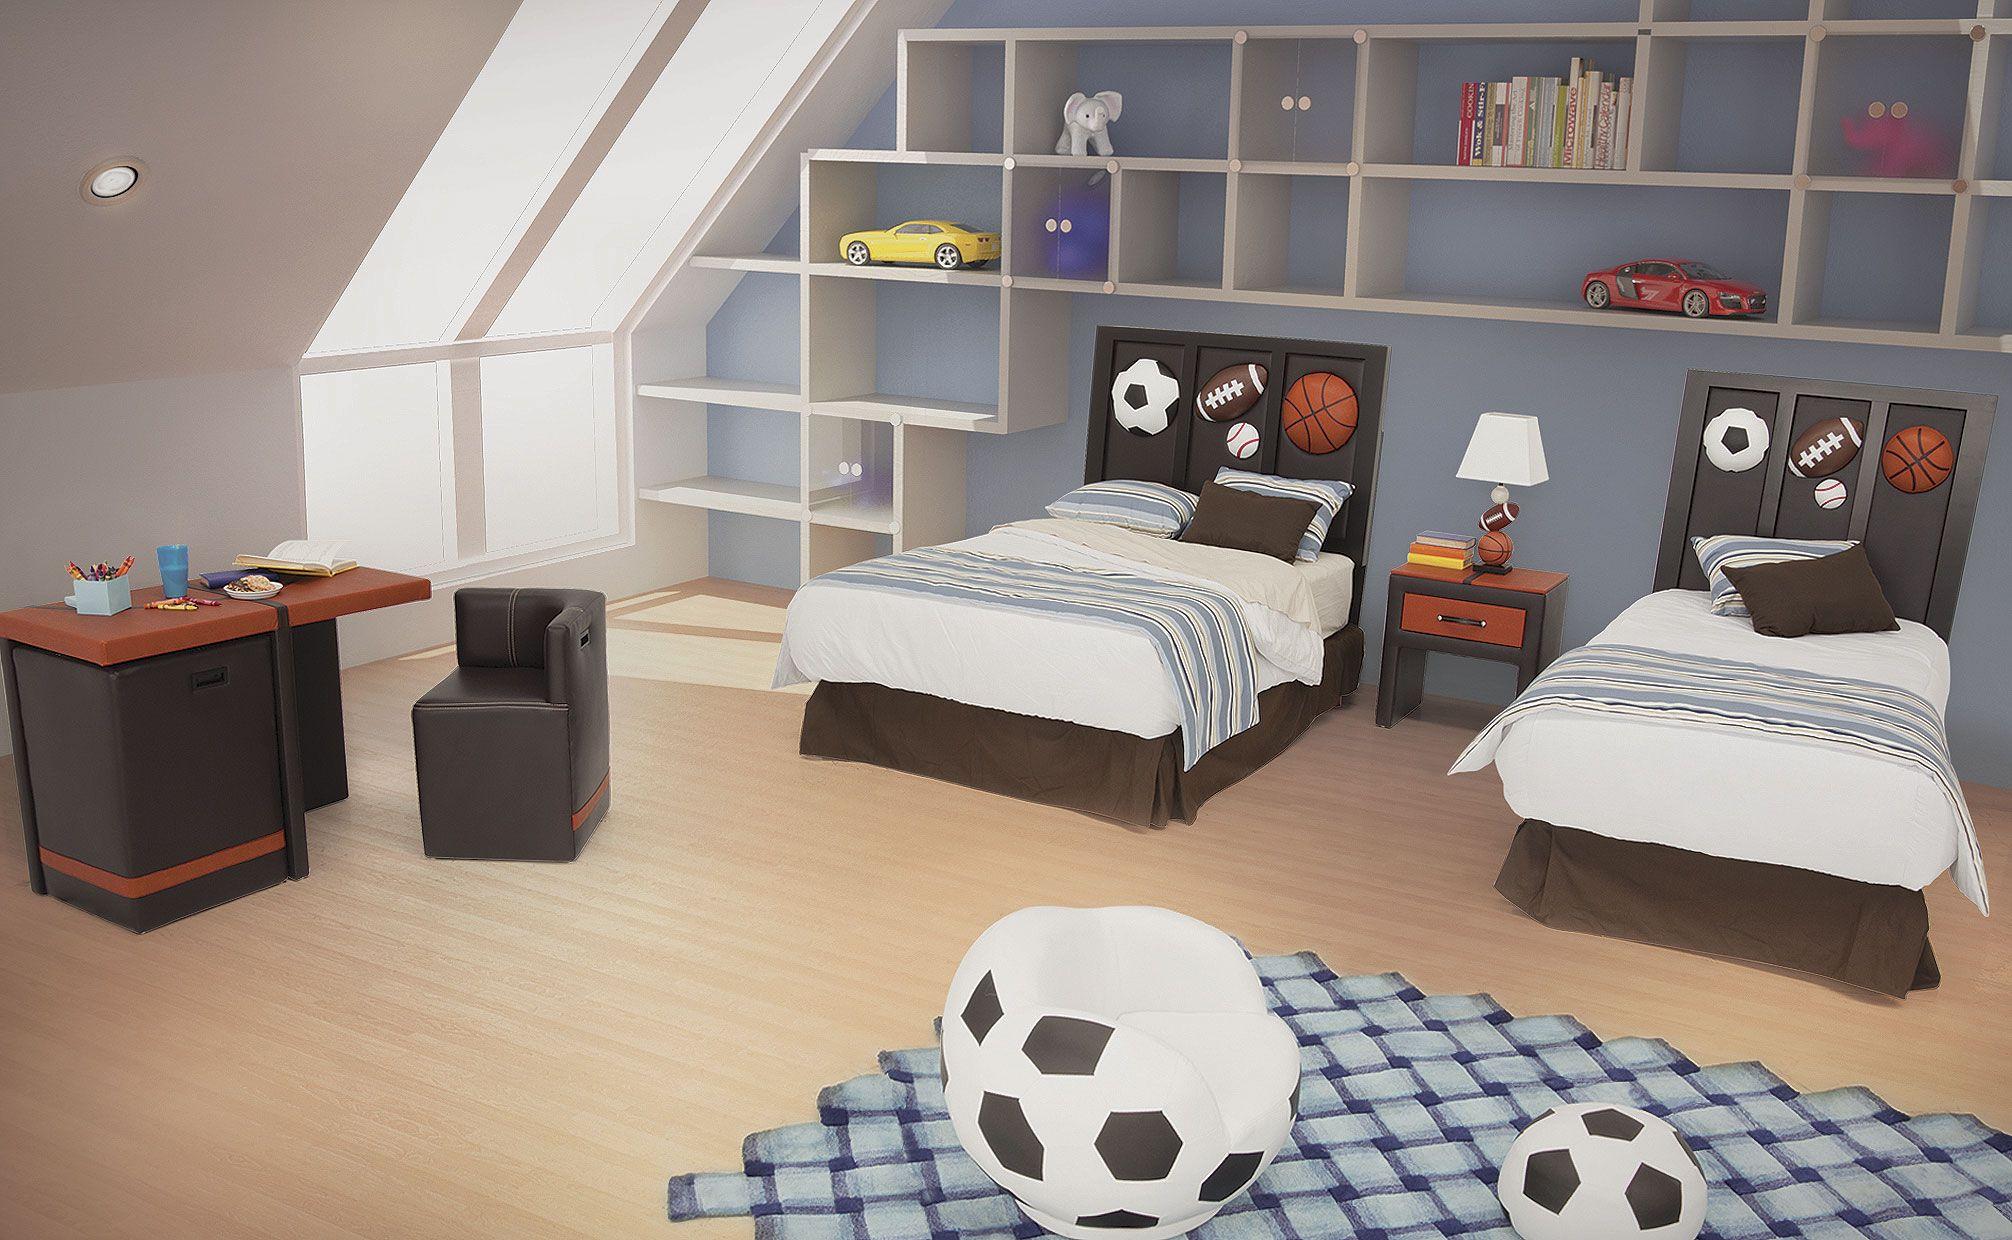 Dormitorio 3D Kids  HOME  Pinterest